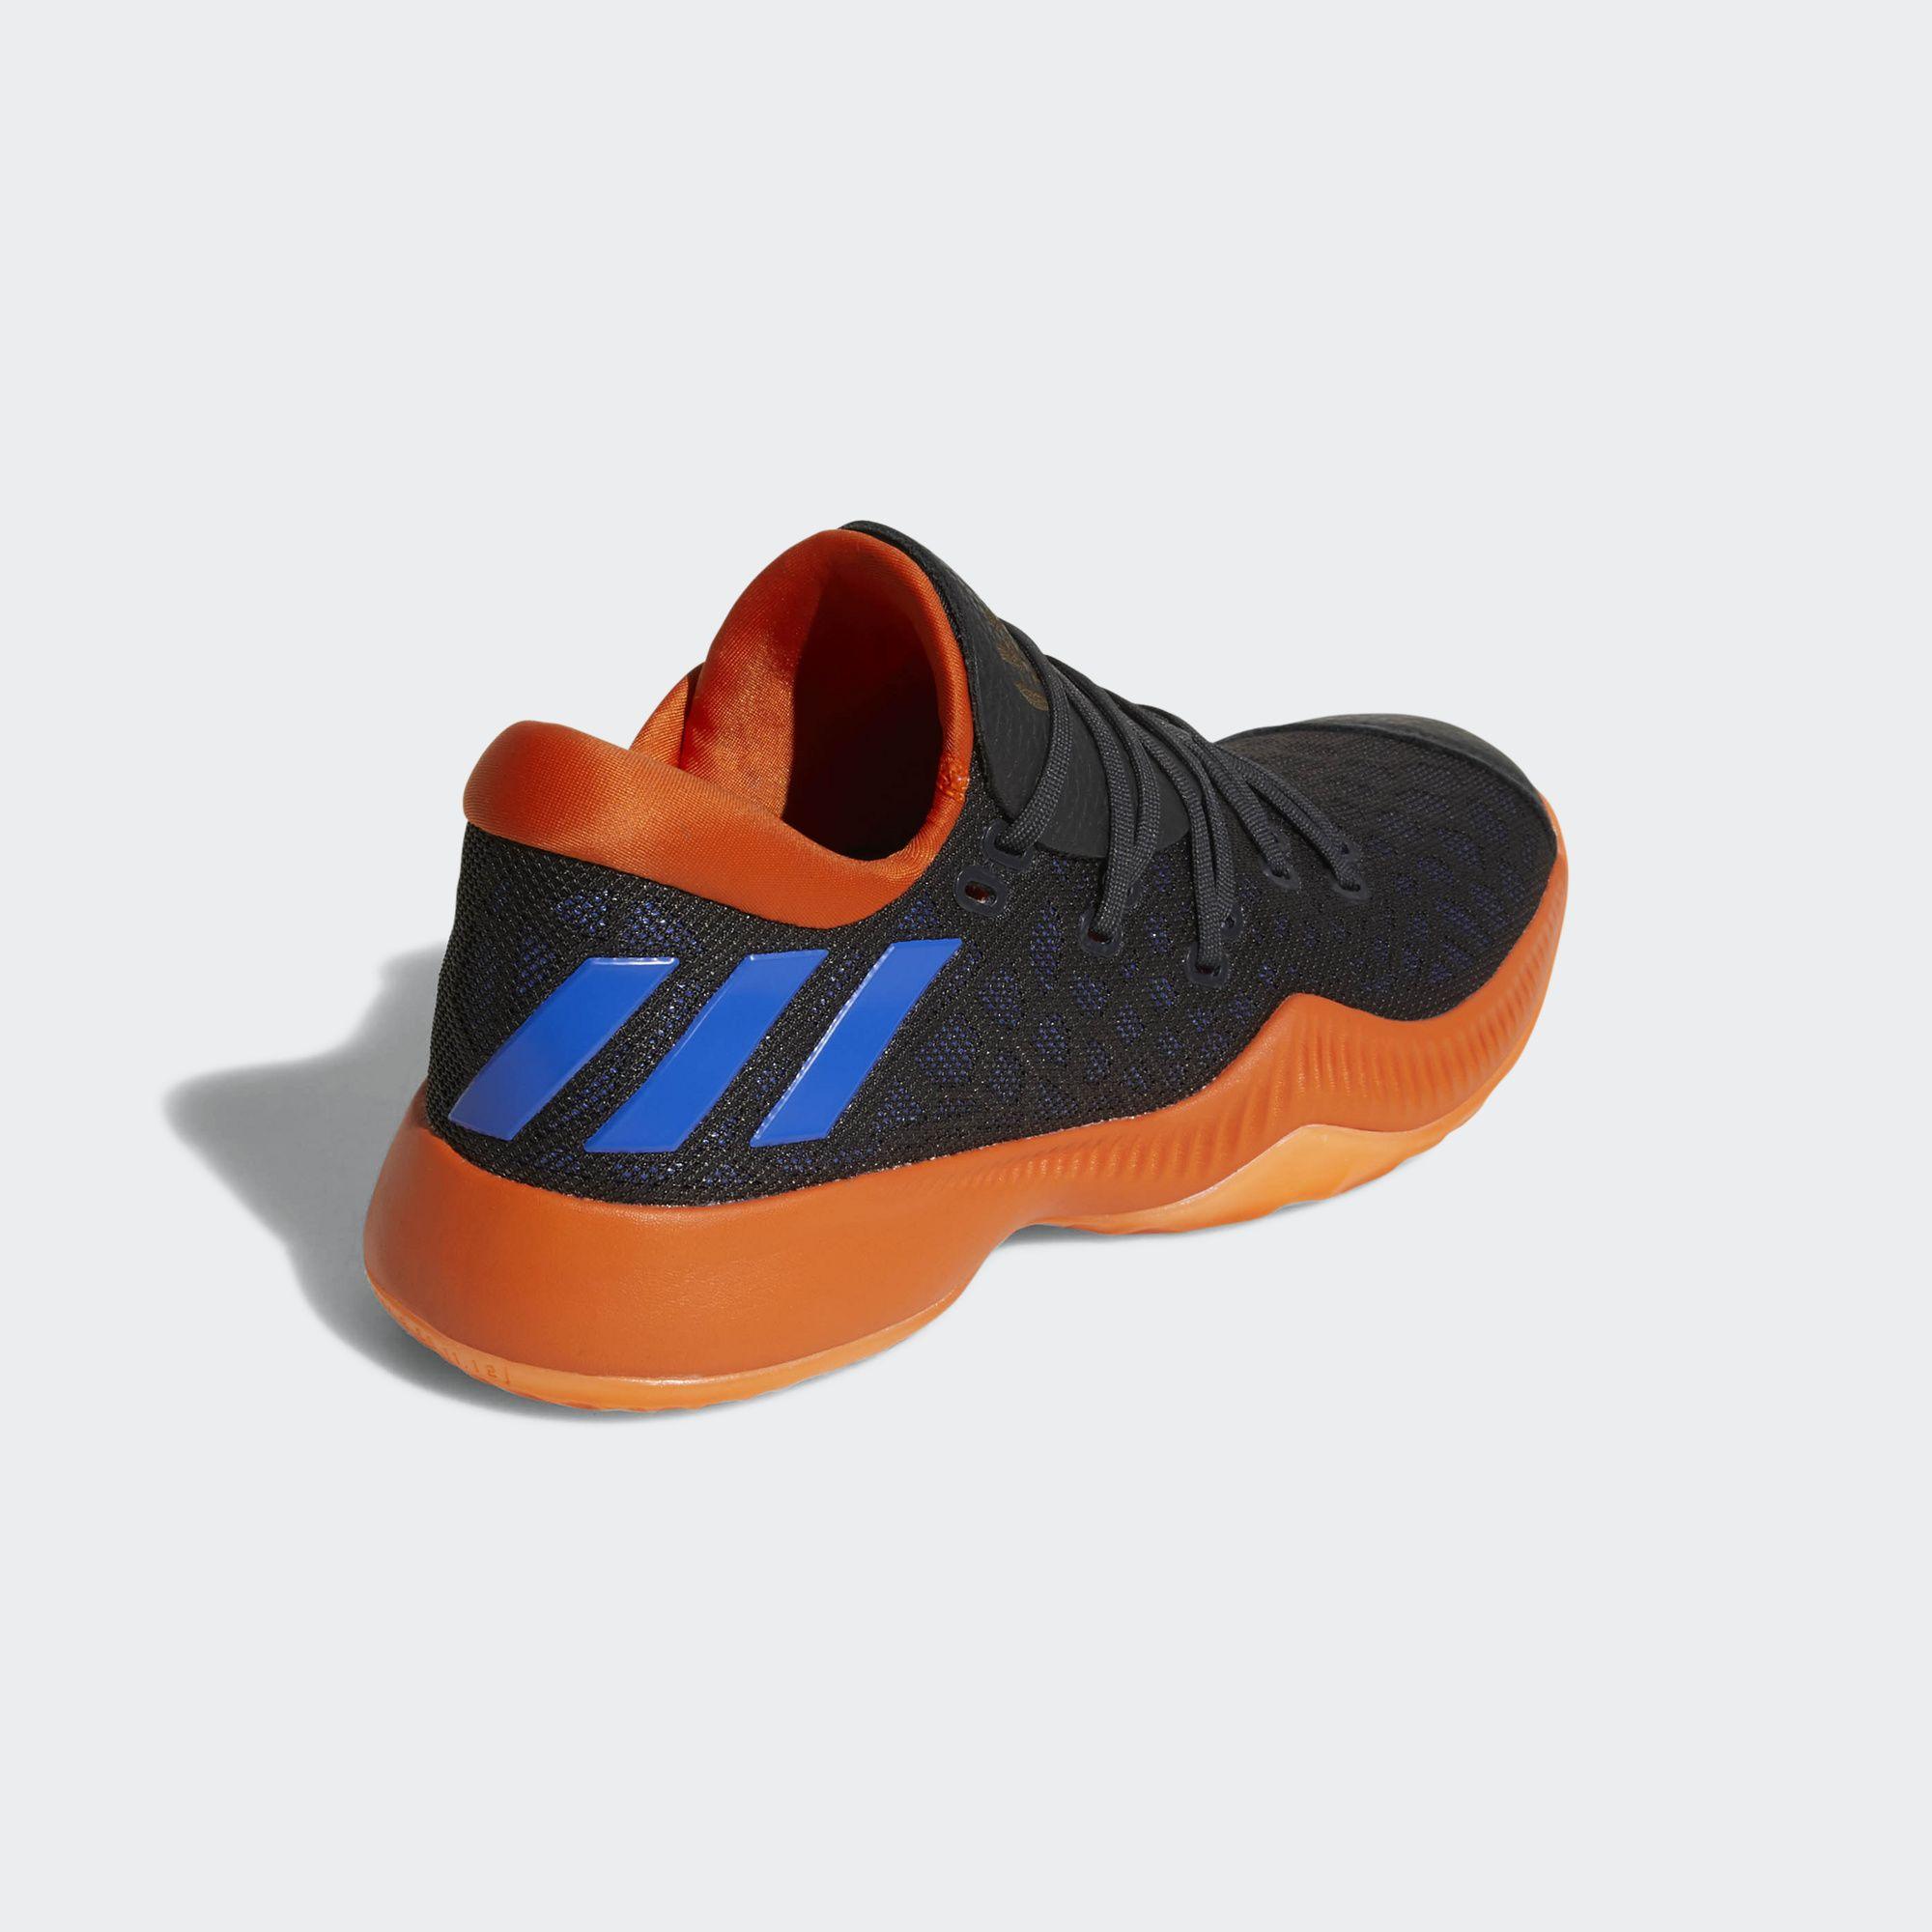 adidas harden b/e black orange blue 1